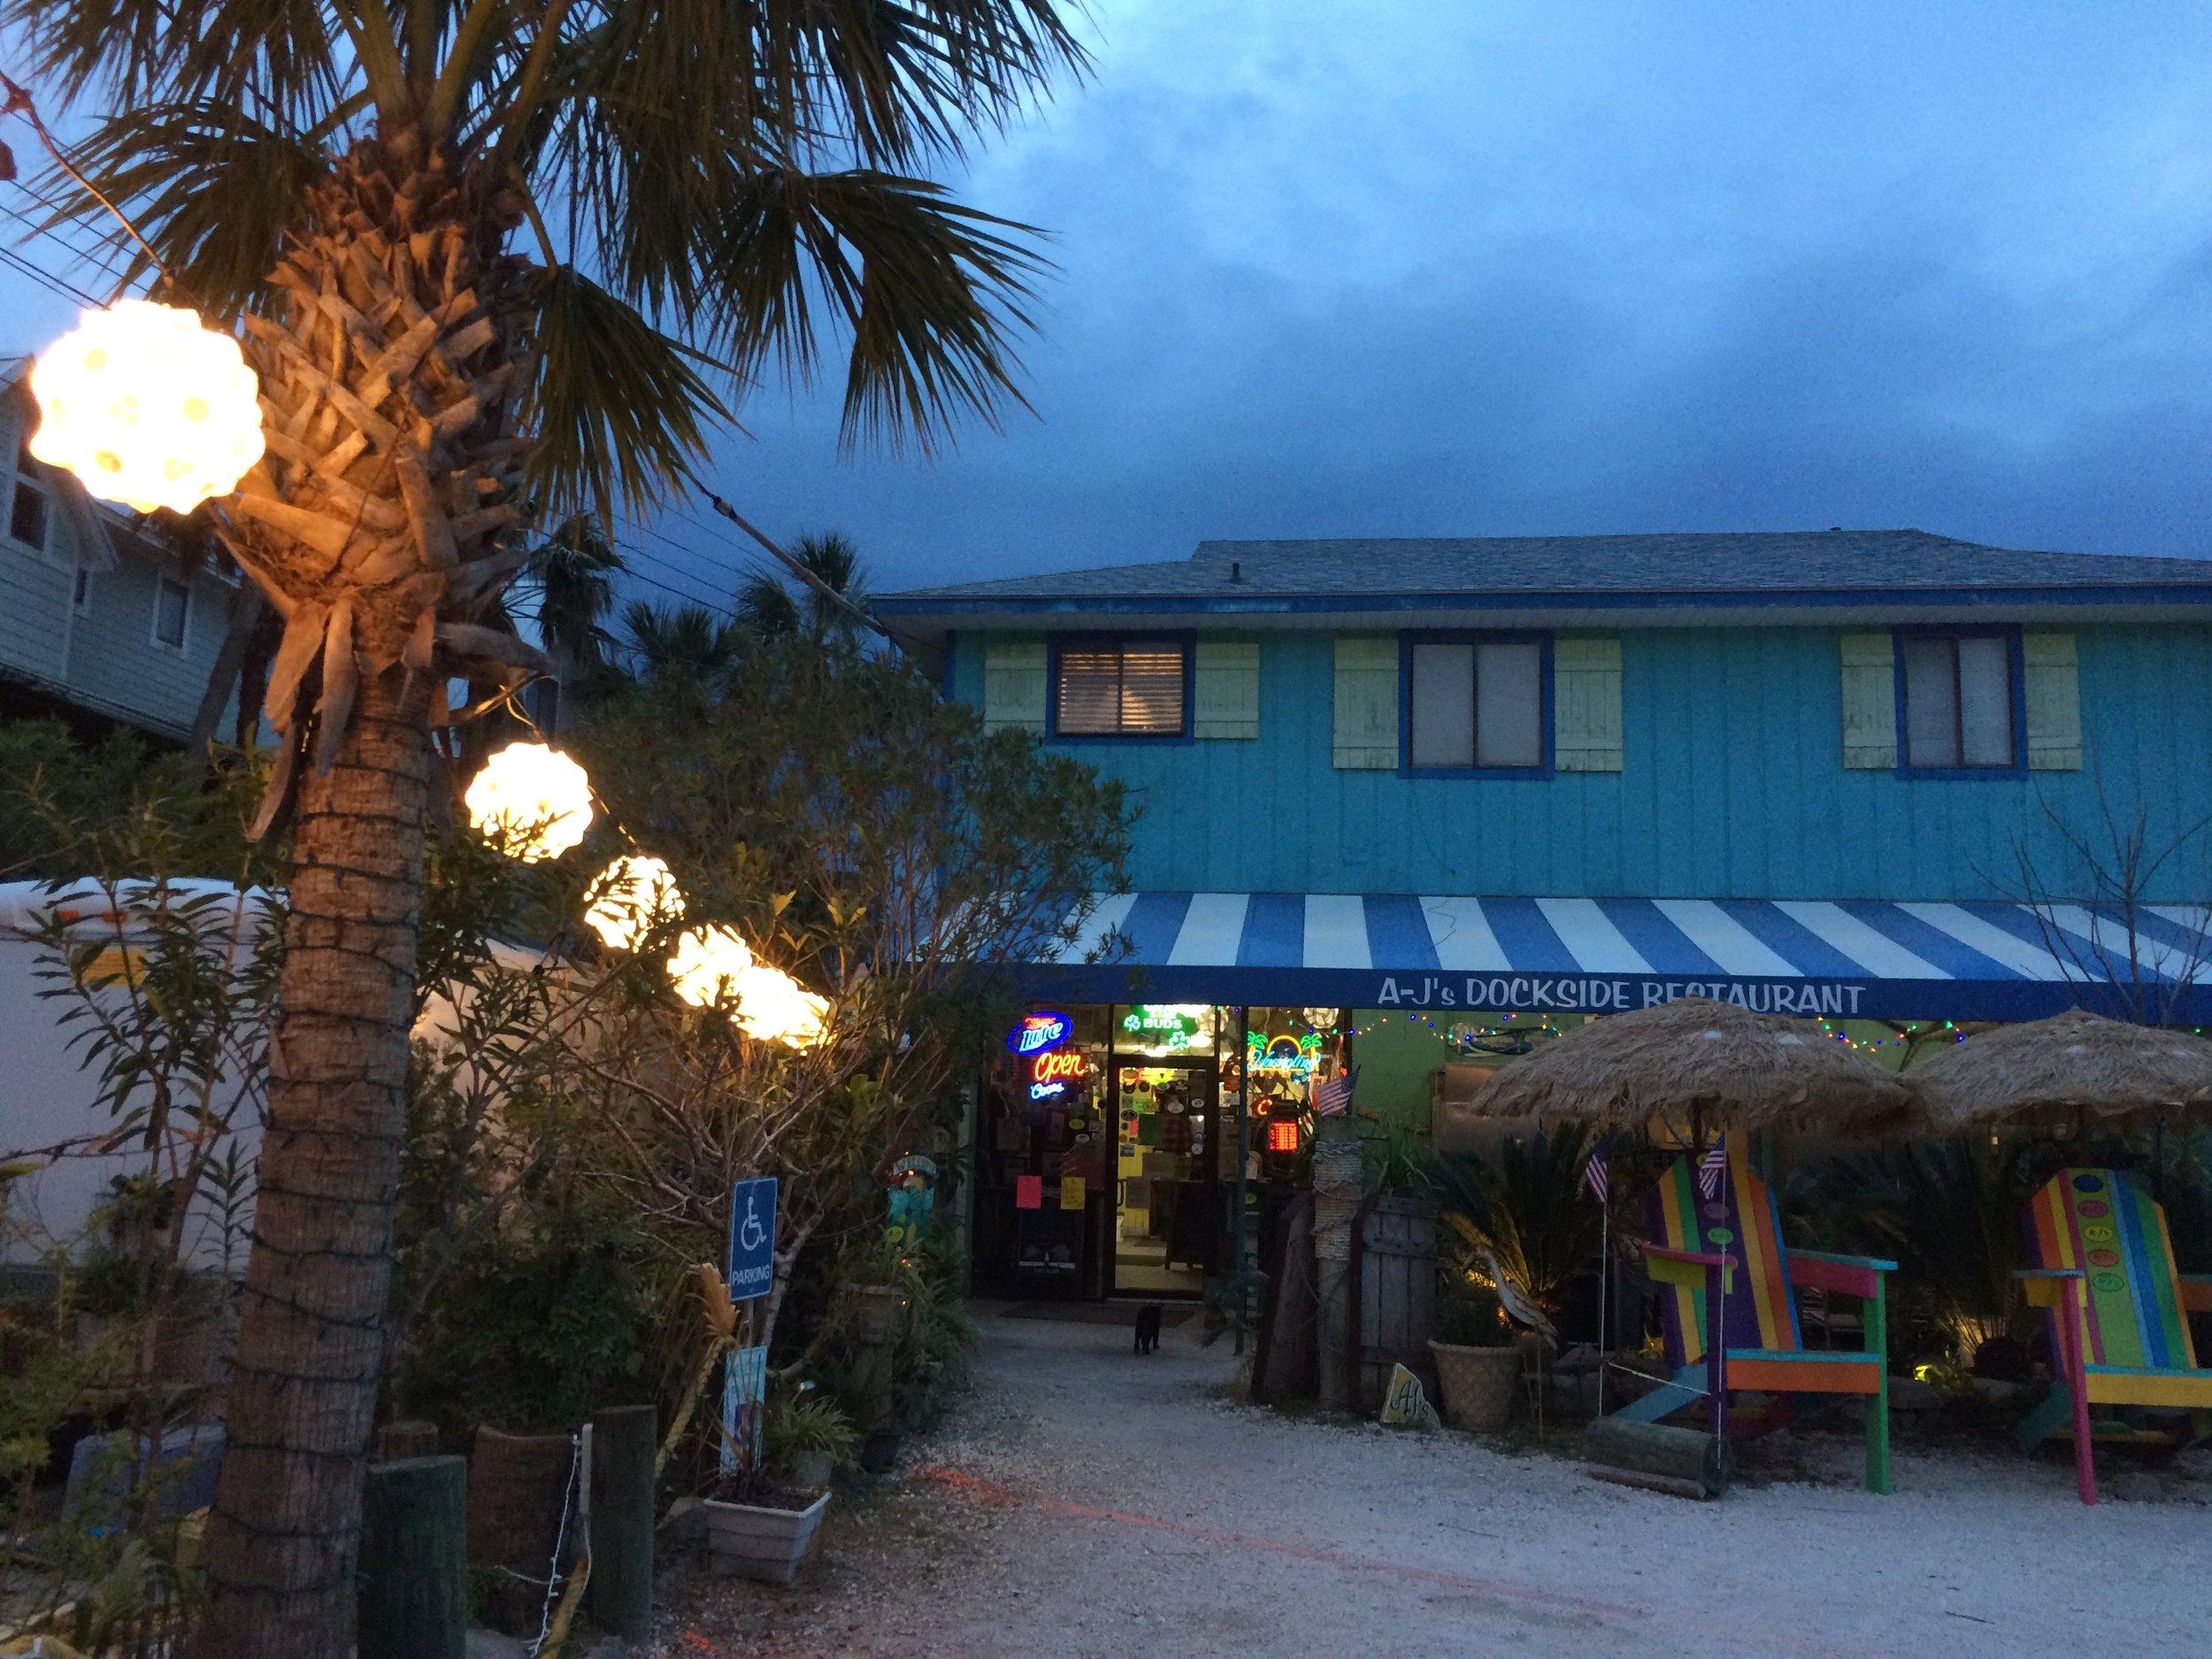 Entrance to A-J's Dockside Restaurant on Tybee Island